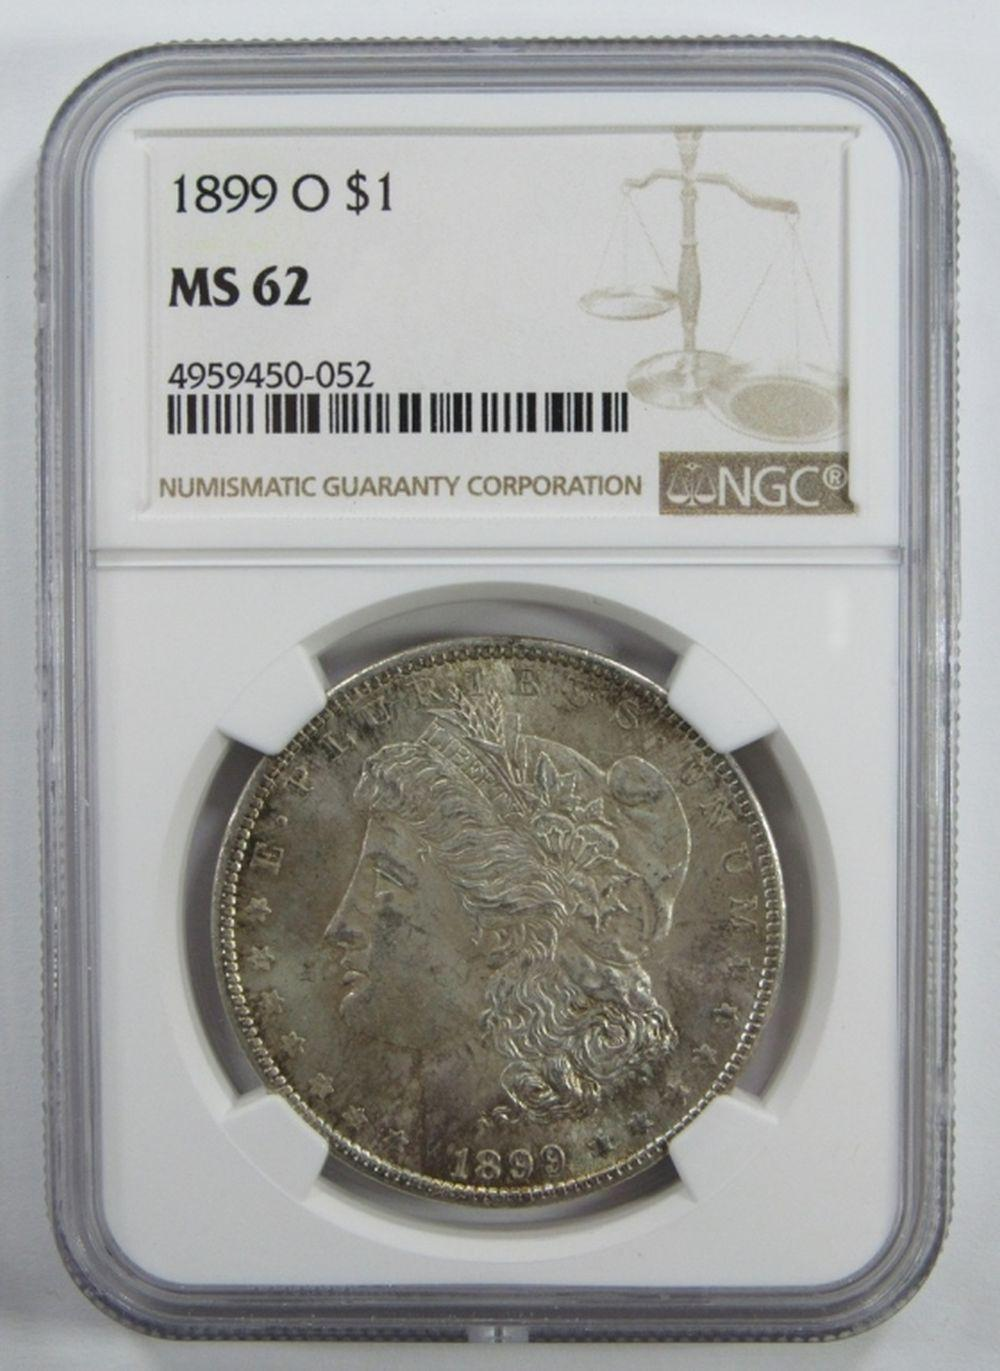 Lot 173: 1899-O Morgan Silver Dollar $ NGC MS 62